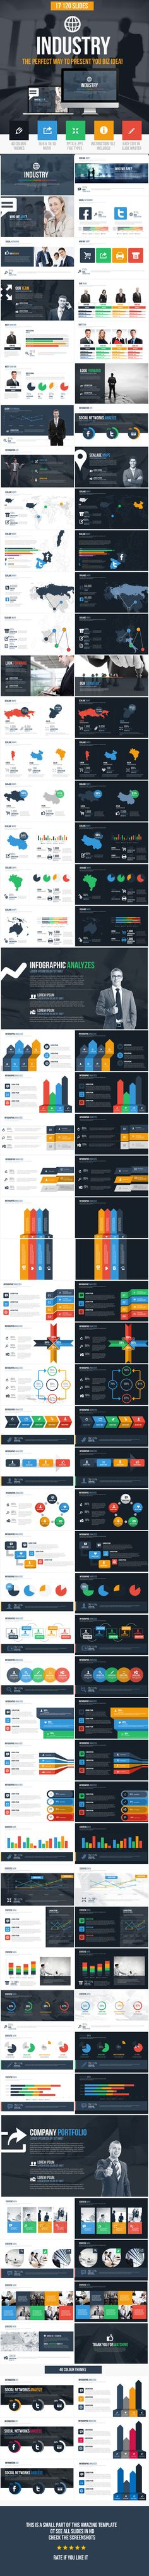 Industry Powerpoint Presentation Tempalte #design Download: http://graphicriver.net/item/industry-powerpoint-presentation-template/11805583?ref=ksioks